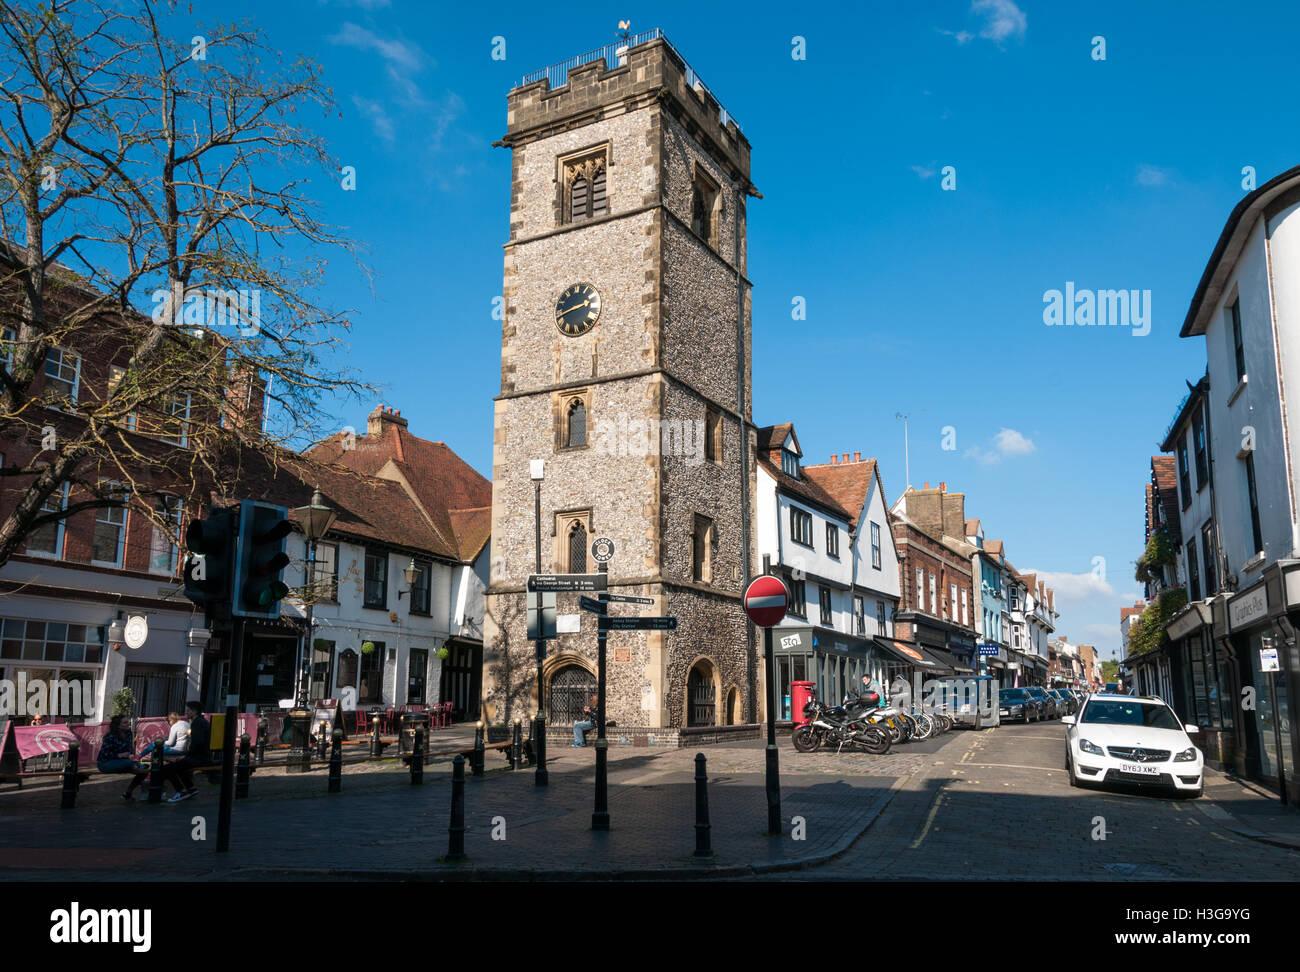 st-albans-clock-tower-united-kingdom-H3G9YG.jpg